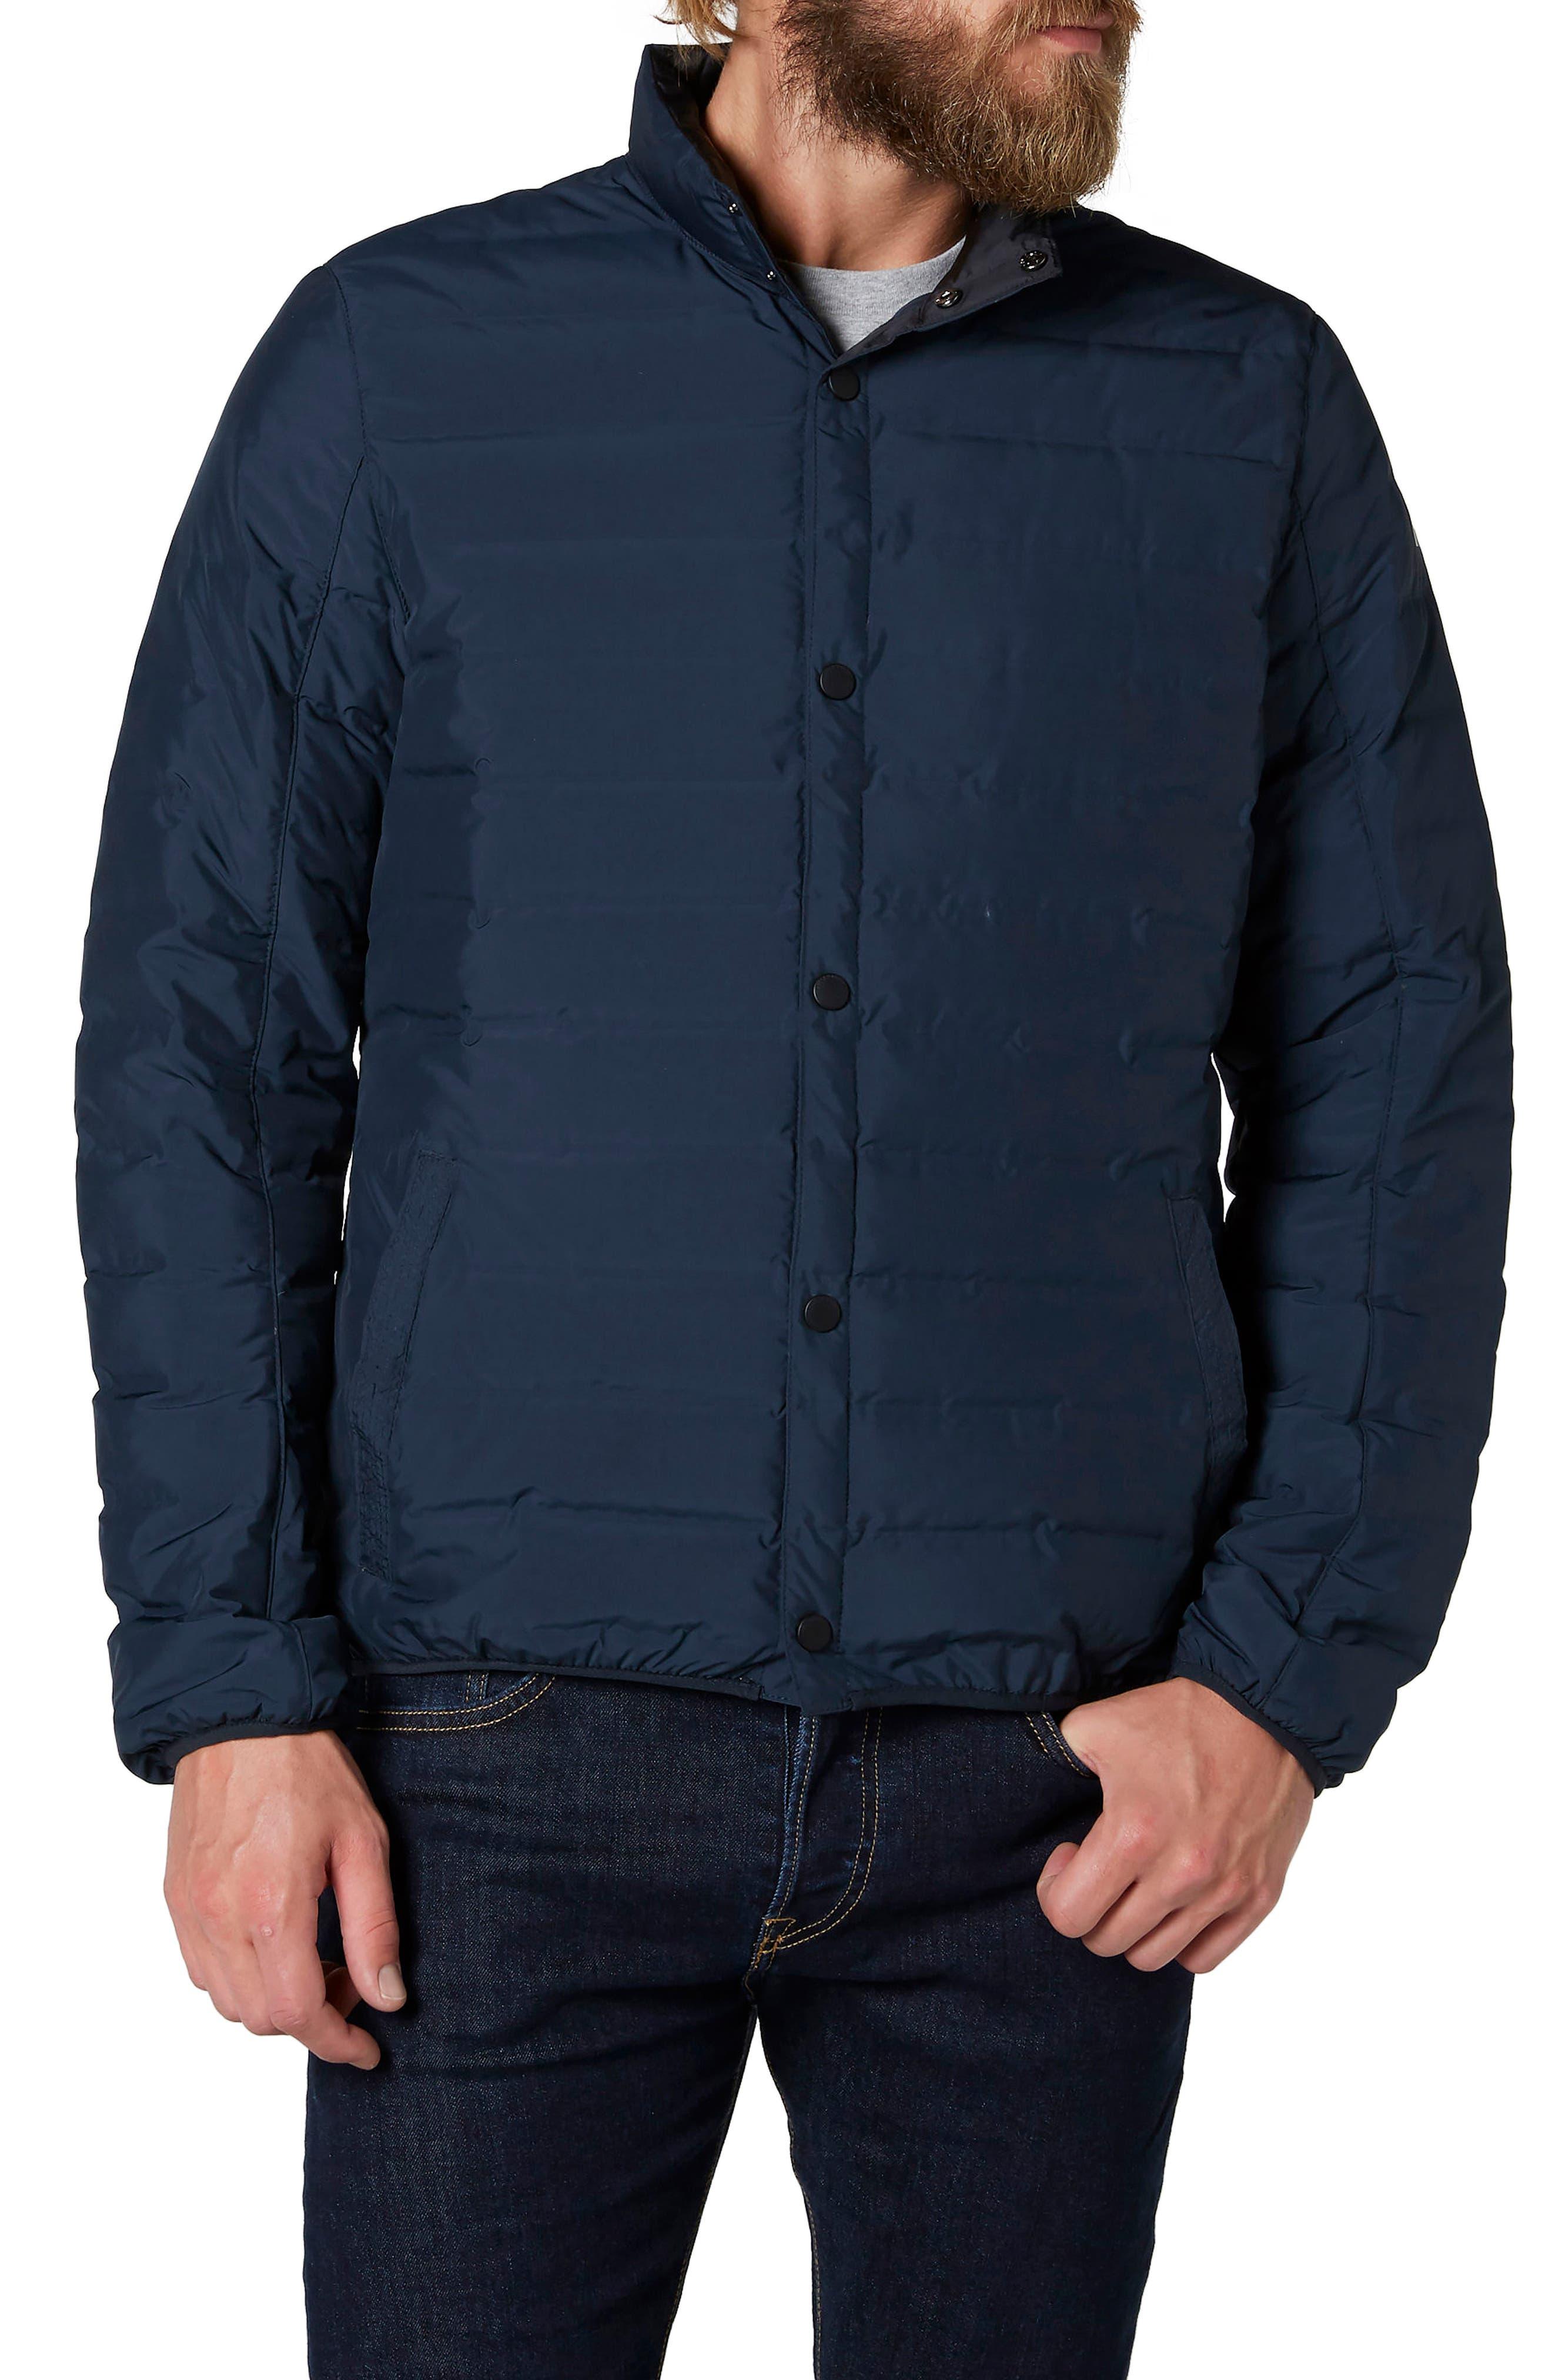 Urban Liner Jacket,                         Main,                         color, NAVY